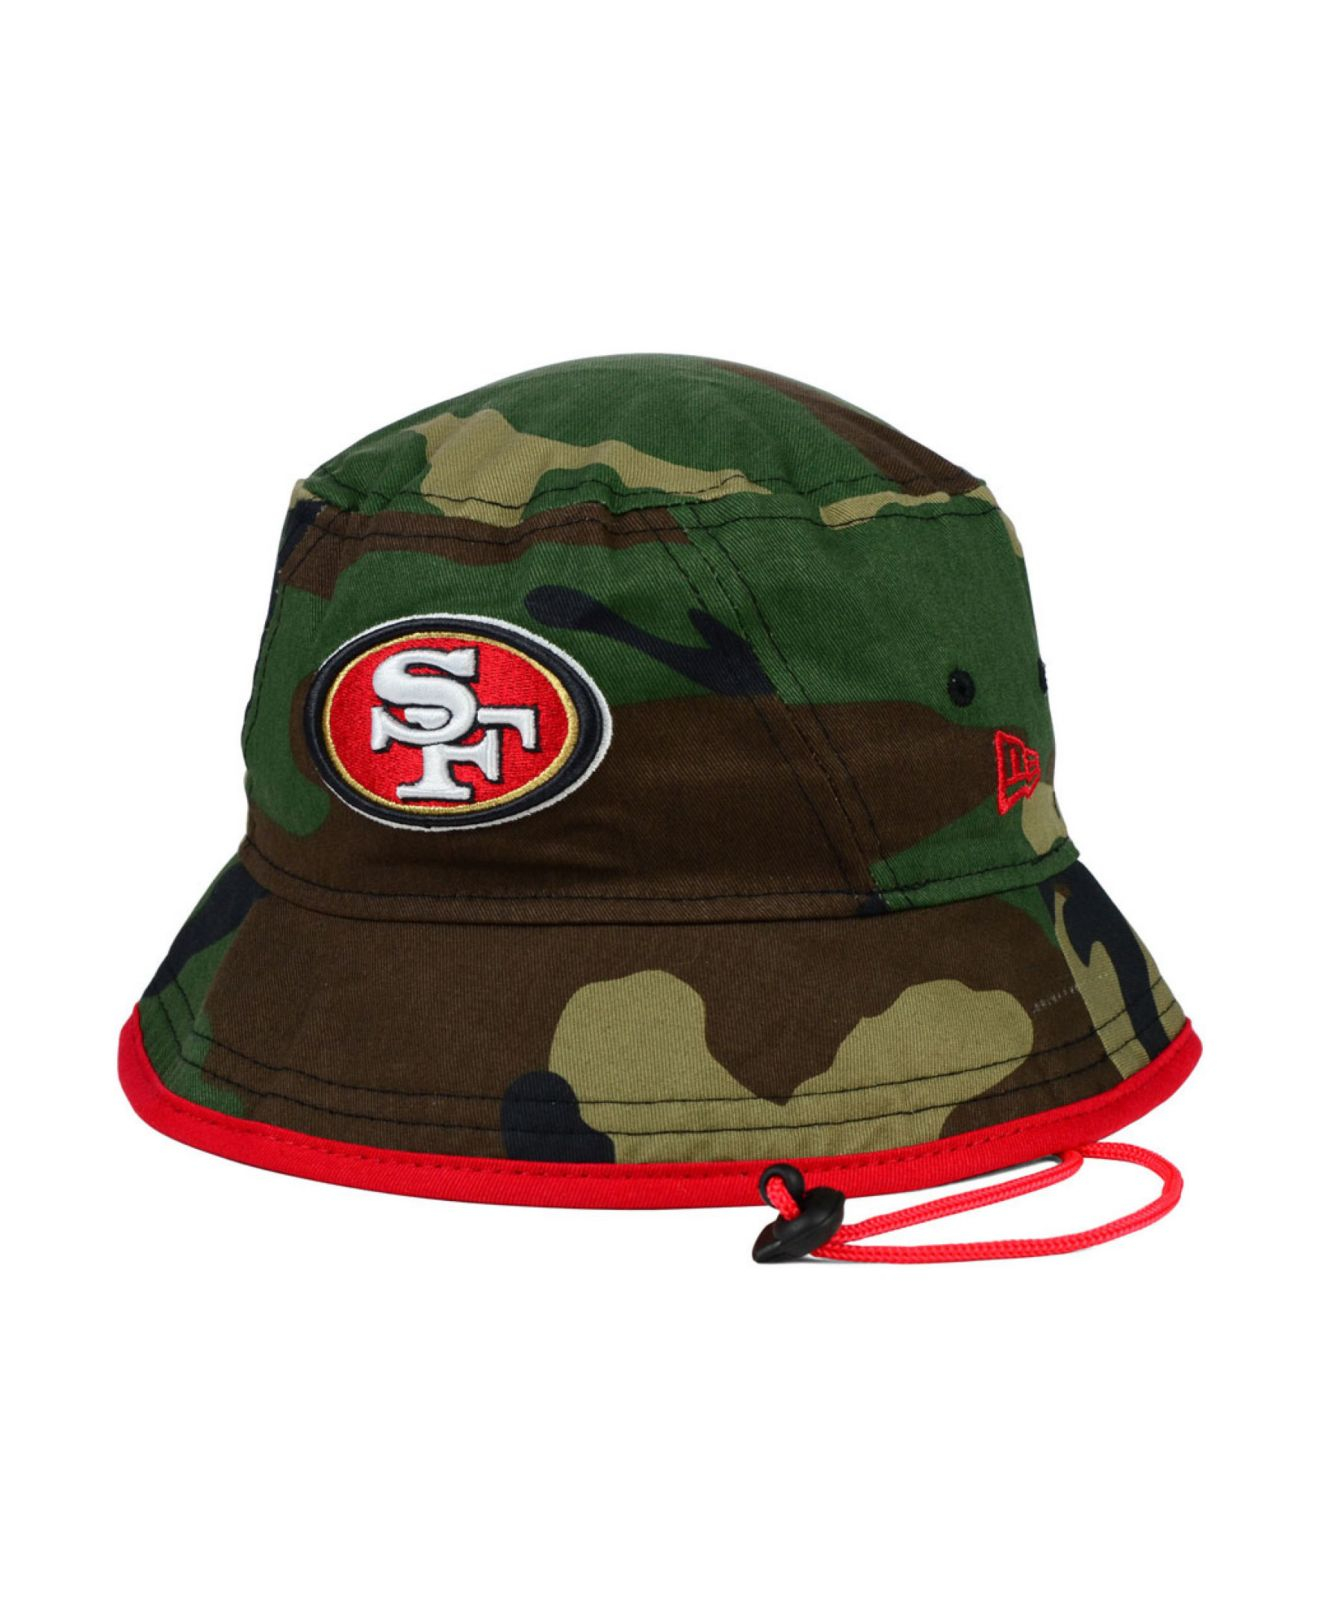 Lyst - KTZ San Francisco 49Ers Camo Pop Bucket Hat in Green for Men 0c0dda968